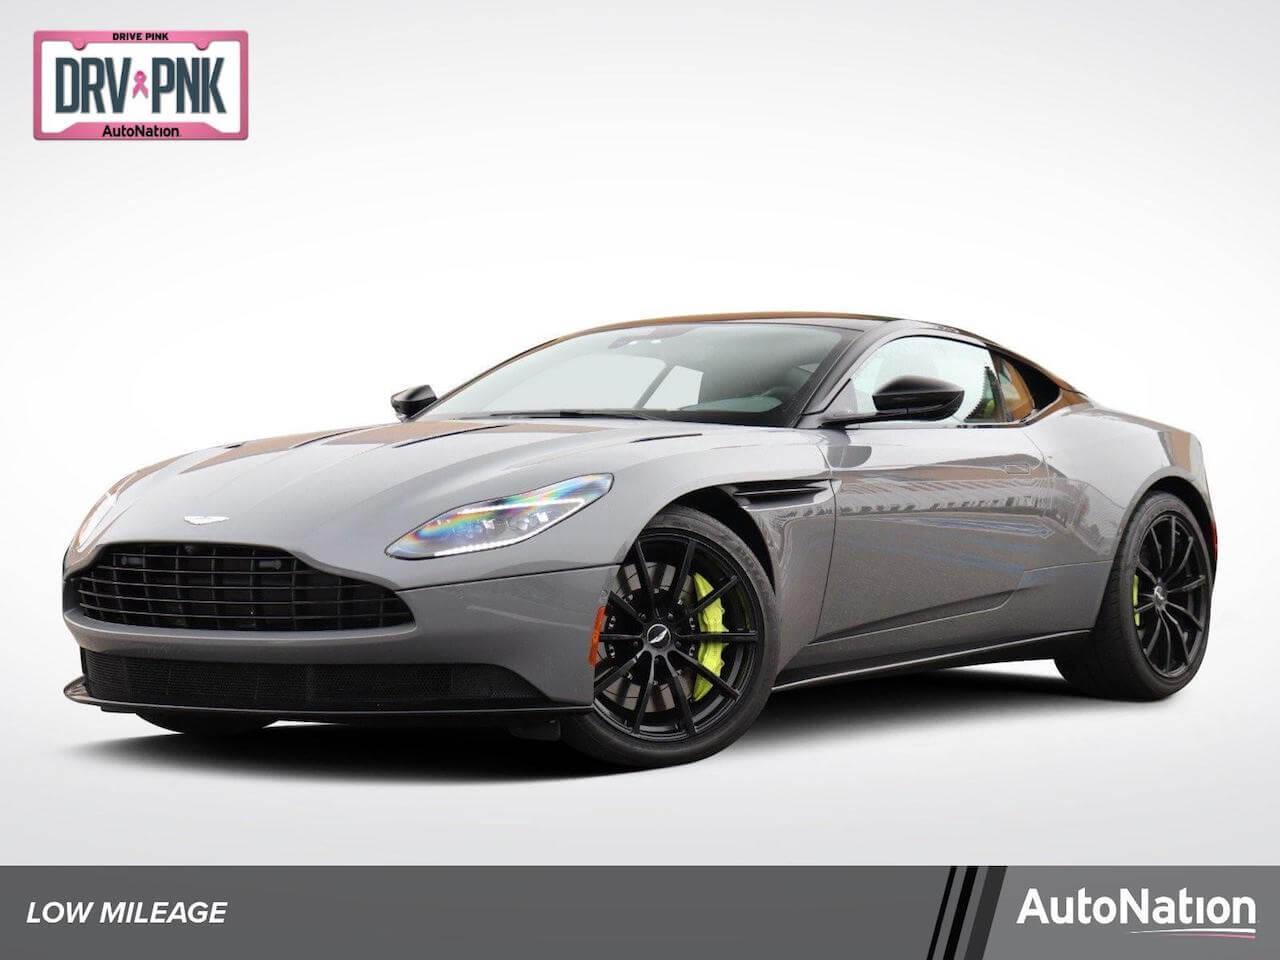 2019 Aston Martin Db11 Amr For Sale In Newport Beach Ca Autonation Drive